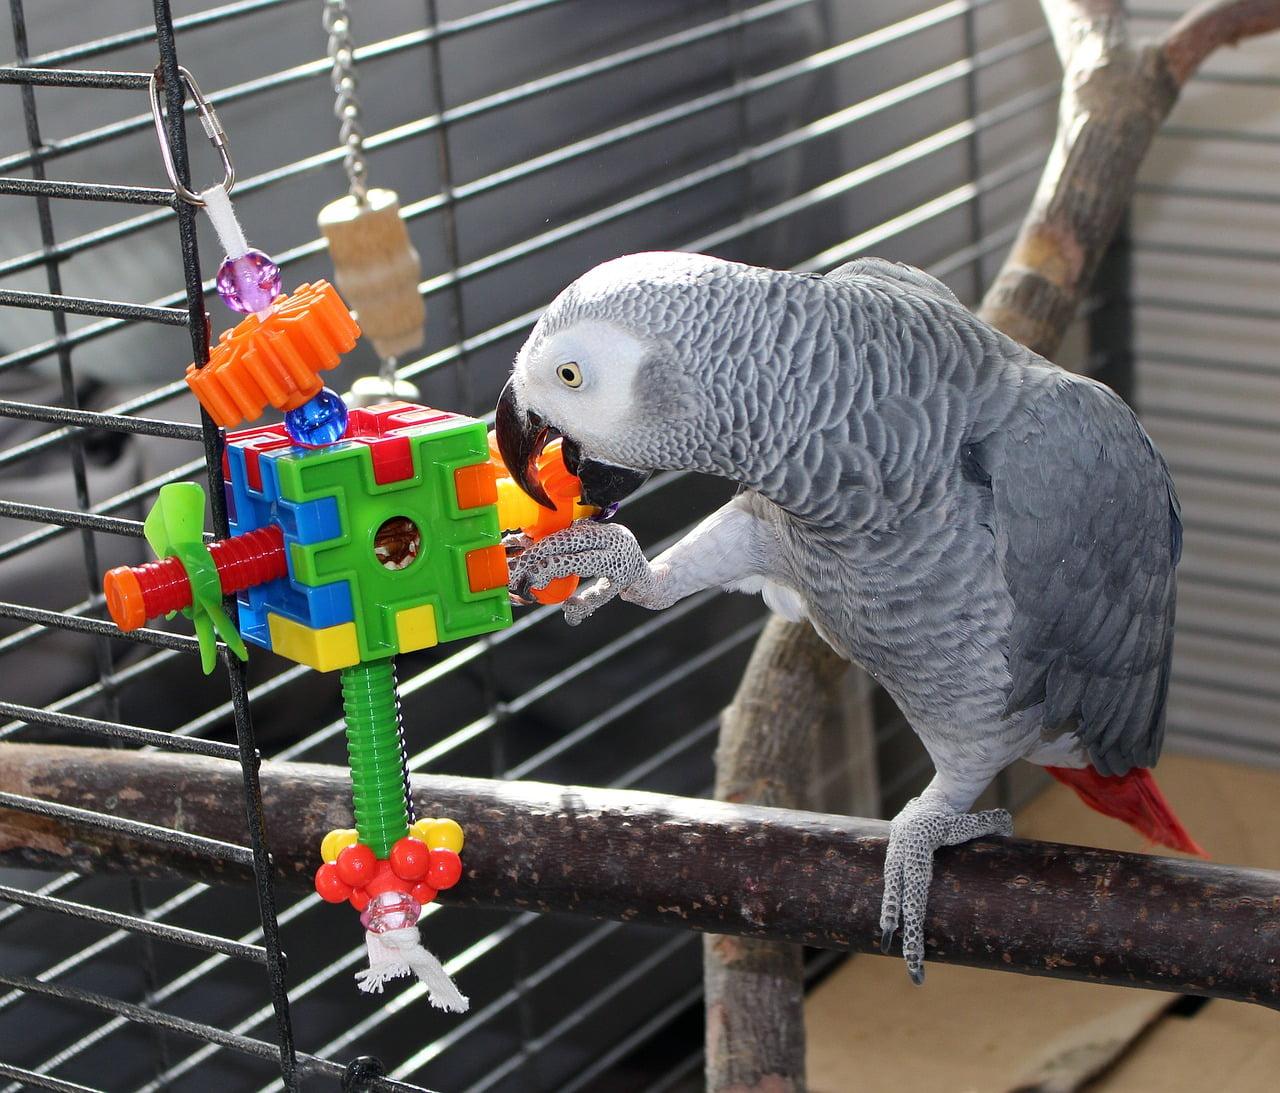 juguetes para pájaros